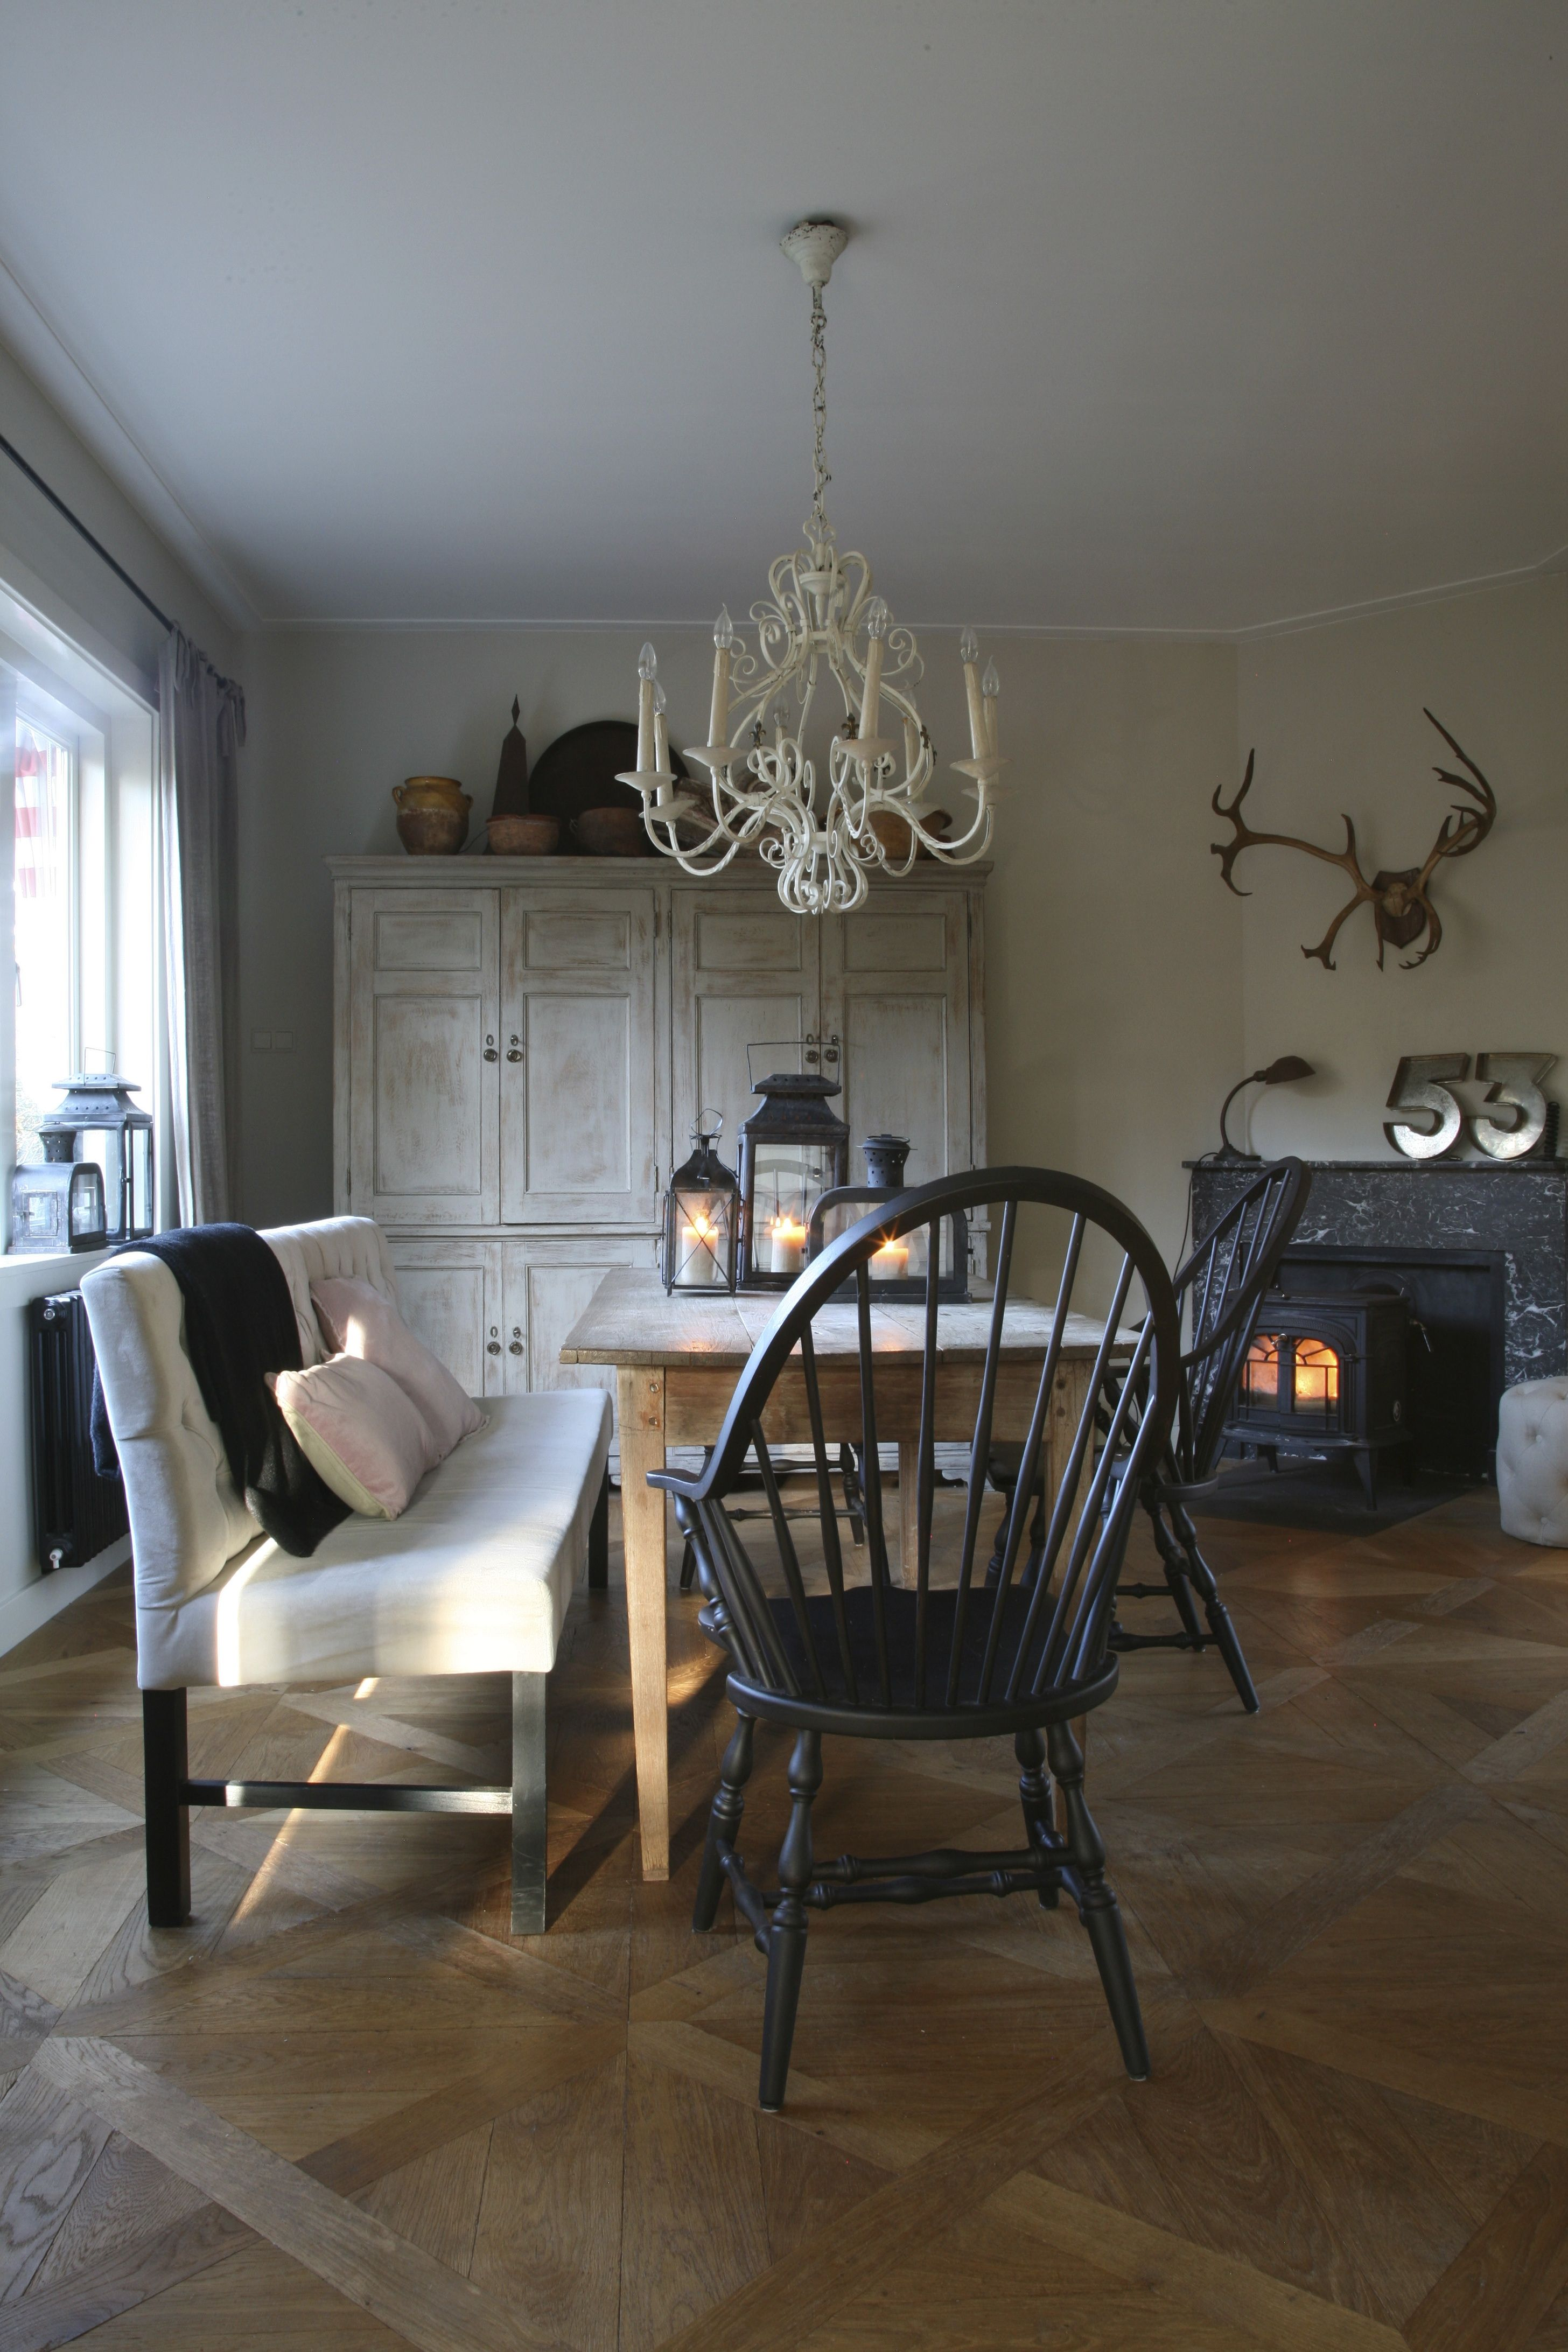 Beau Lost U0026 Found Interiors. Photo: Pia Van Spaendonck, Seasons